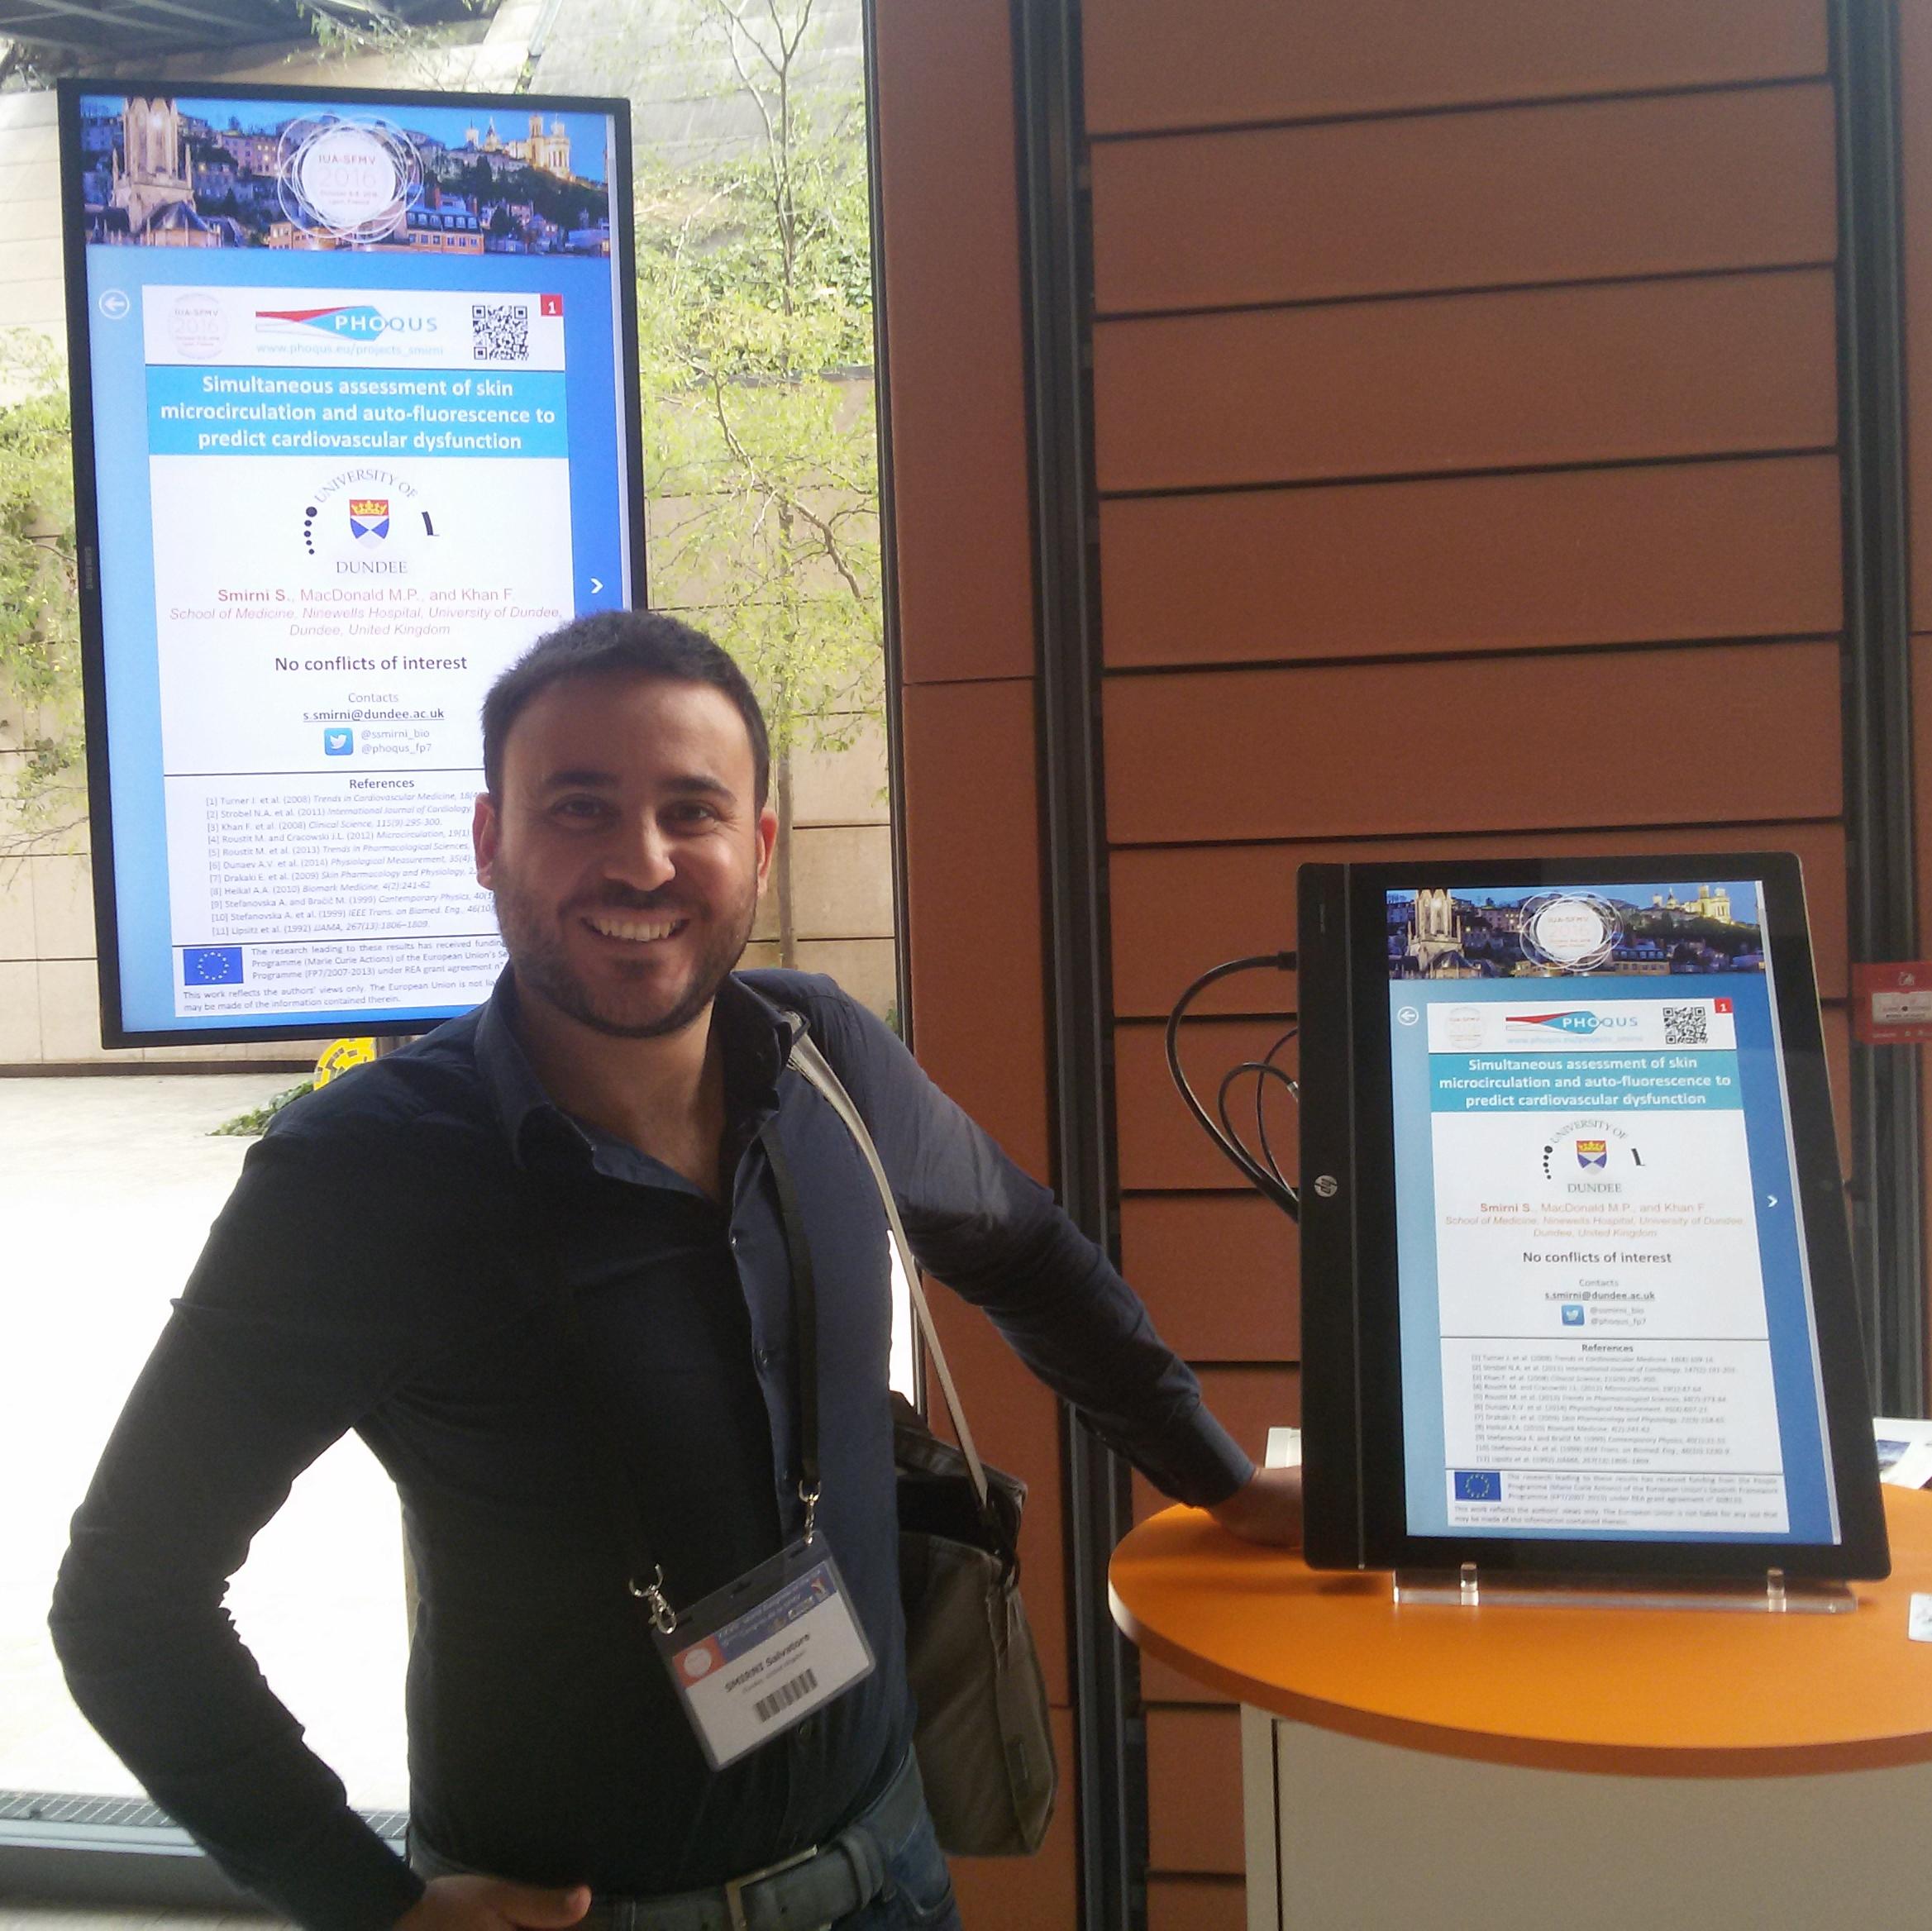 Presentazioni a conferenze internazionali